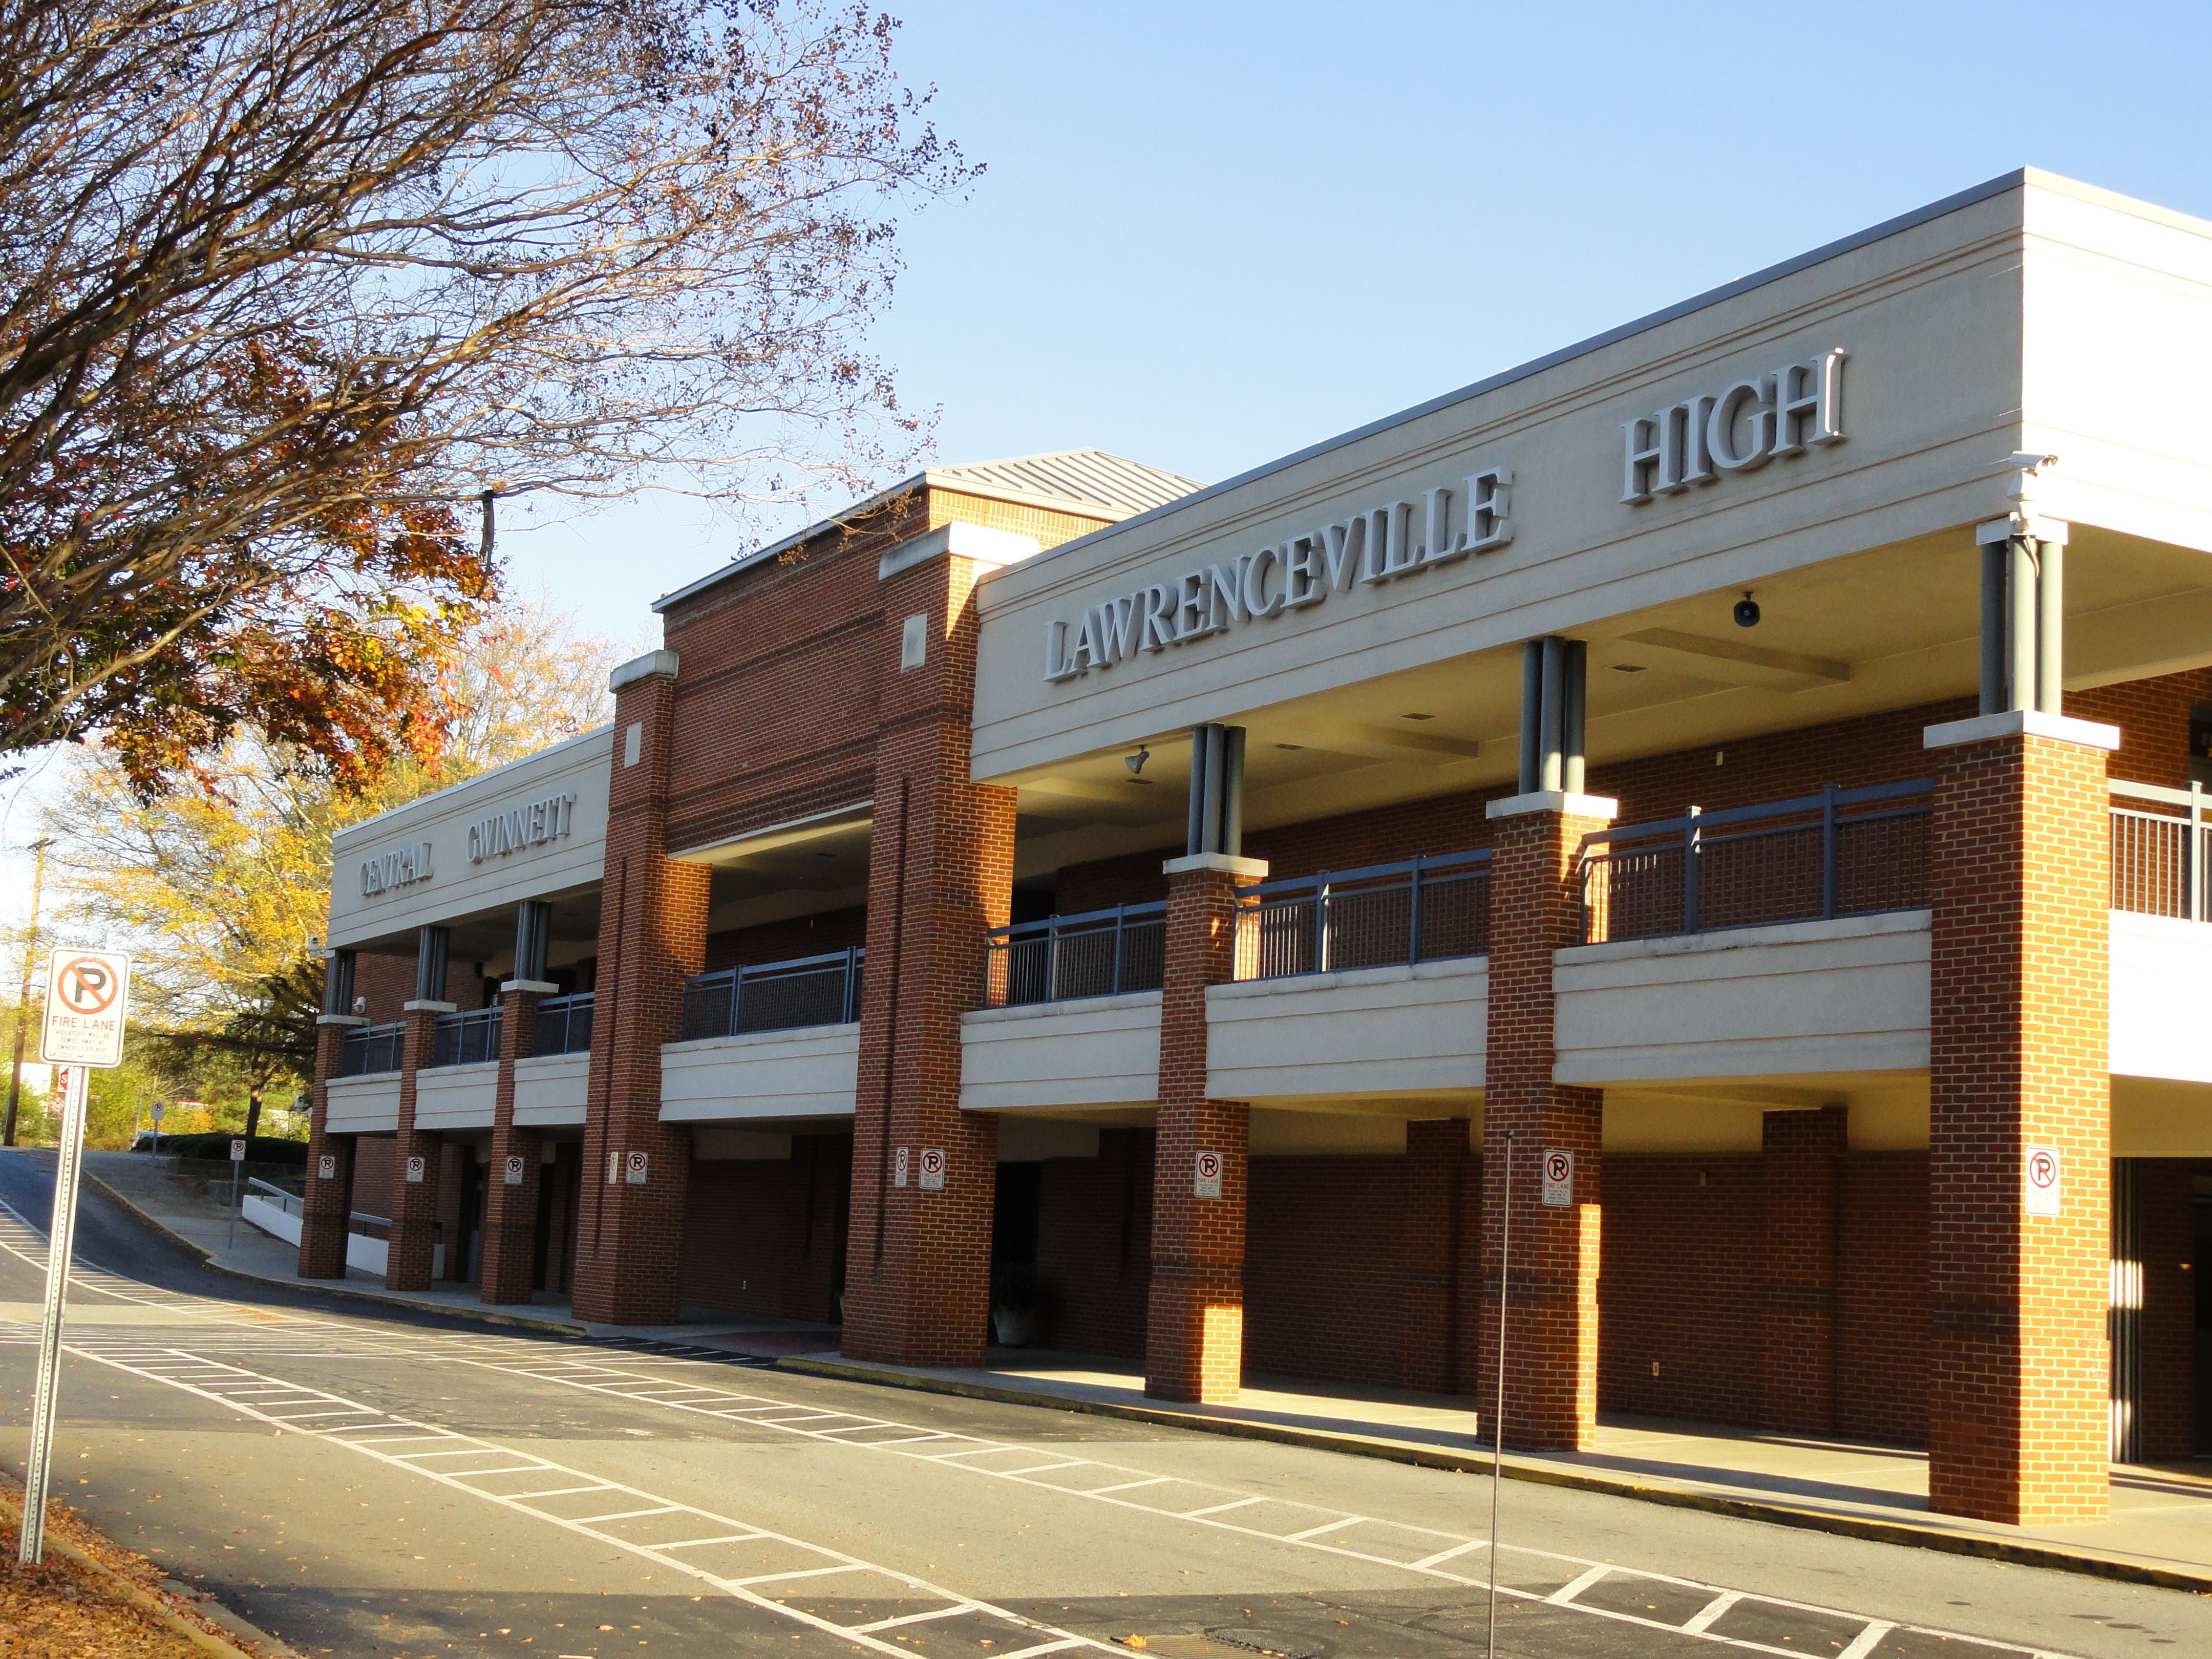 Central Gwinnett High School Graduation Lawrenceville